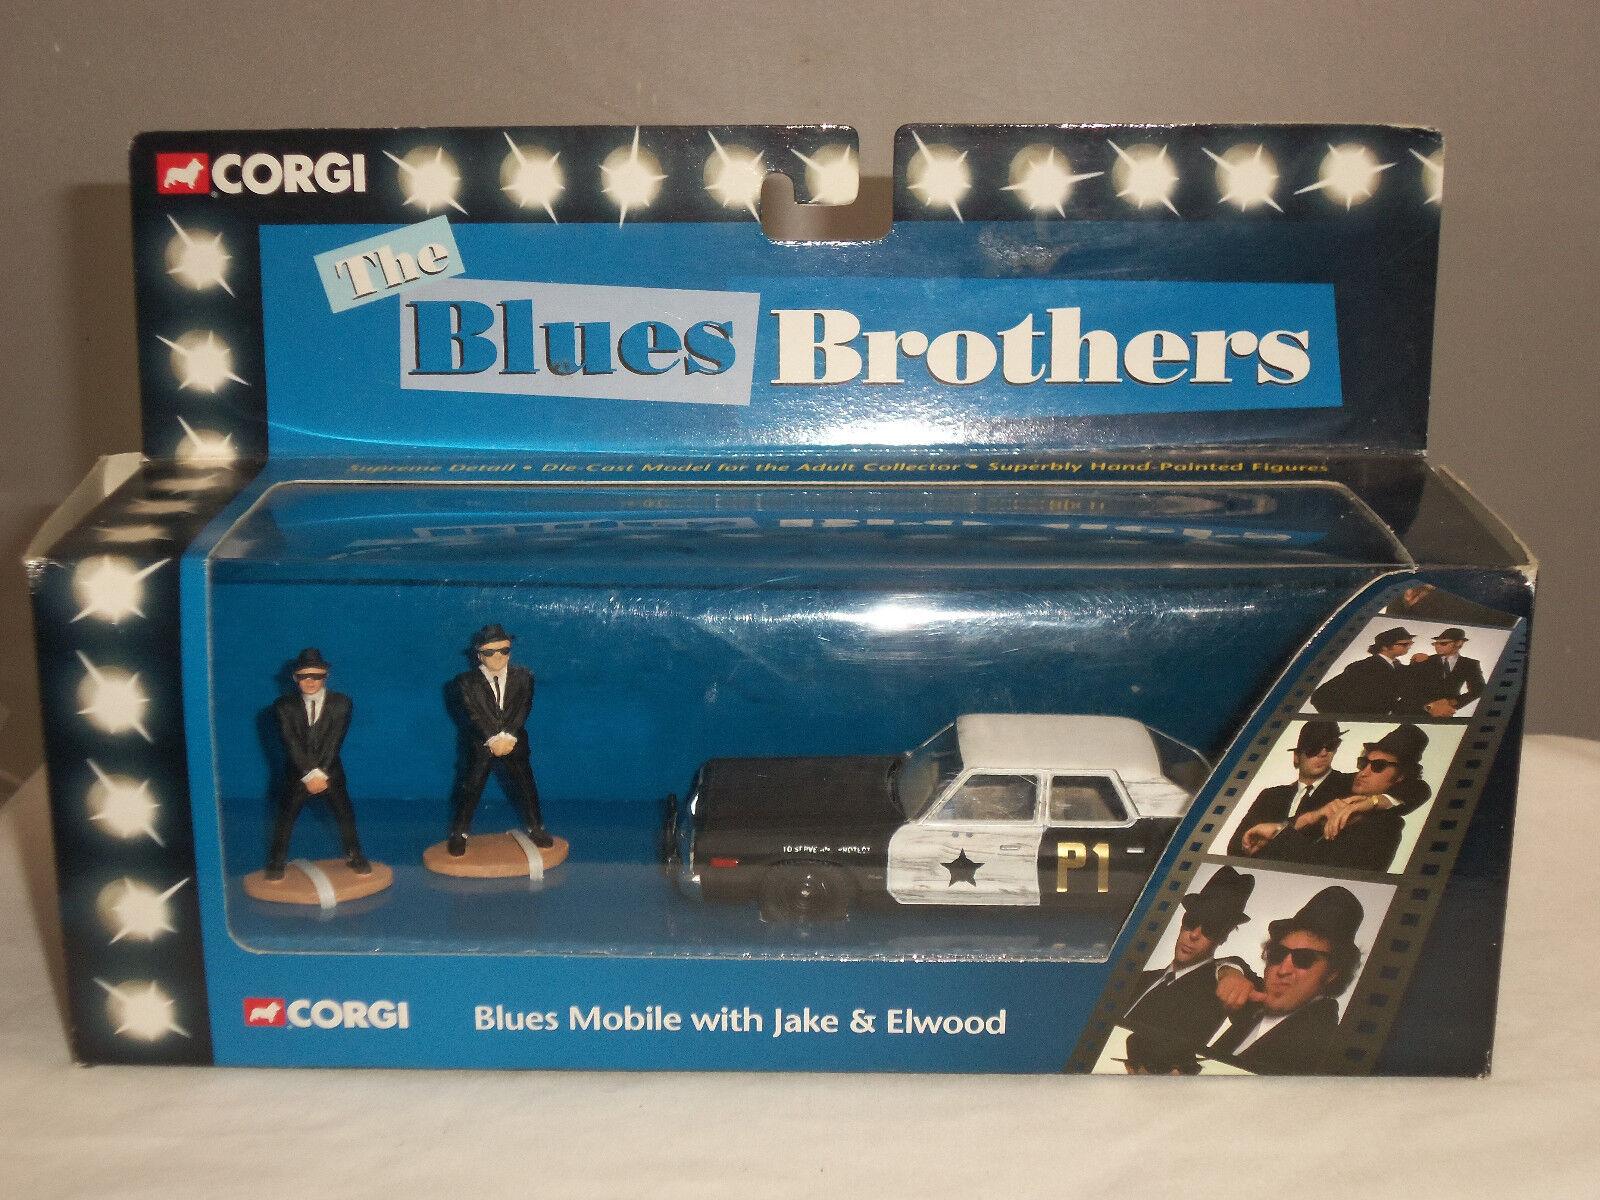 Corgi 06001 azuls Brojohers móvil Diecast Modelo Coche + Jake + Elwood figuras